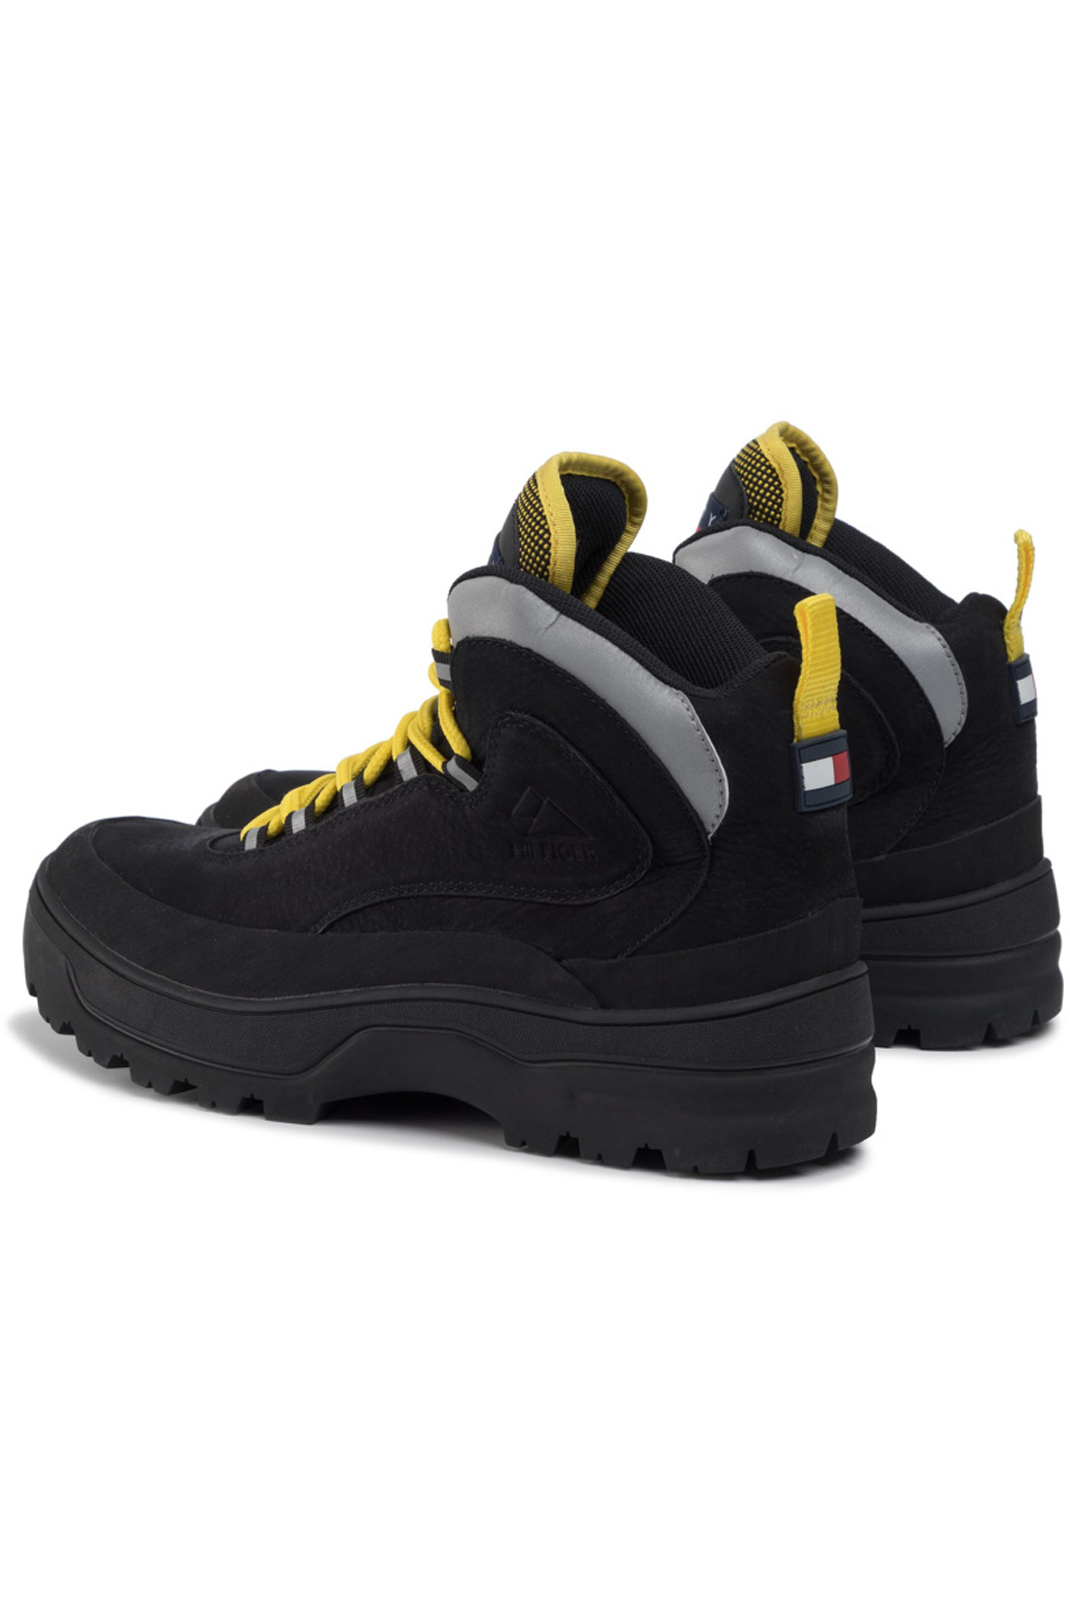 Chaussures de ville  Tommy Jeans EM0EM00301 BLACK